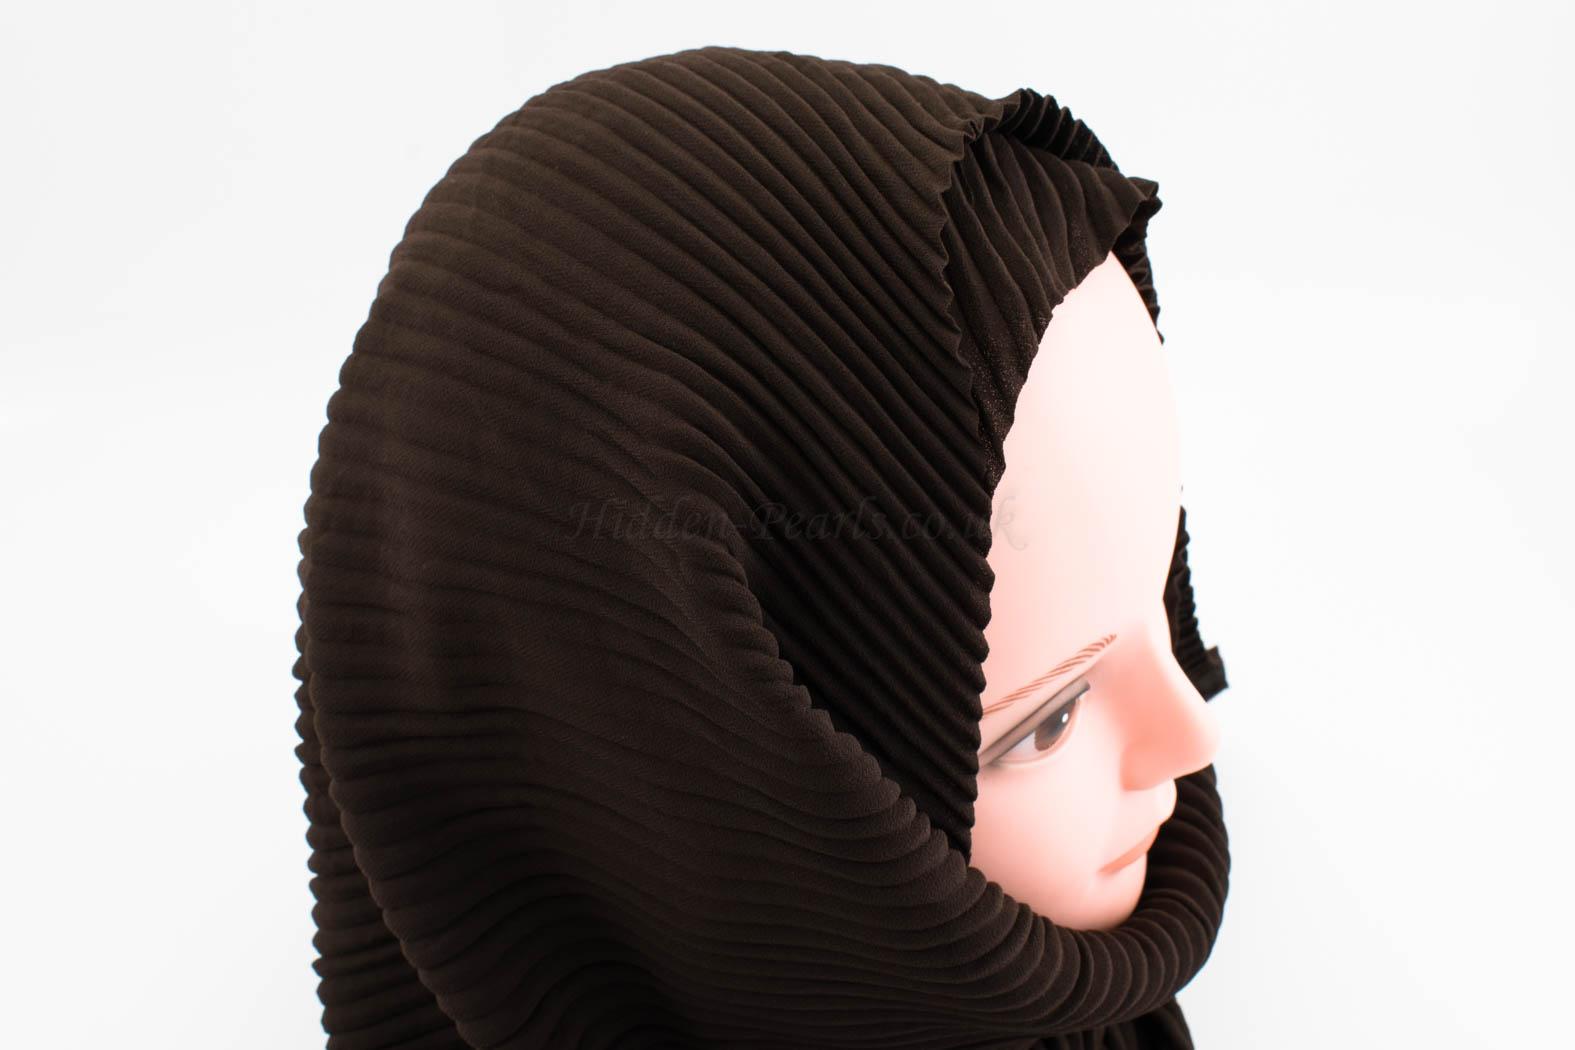 Crinkle Chiffon Hijab - Chocolate - Hidden Pearls